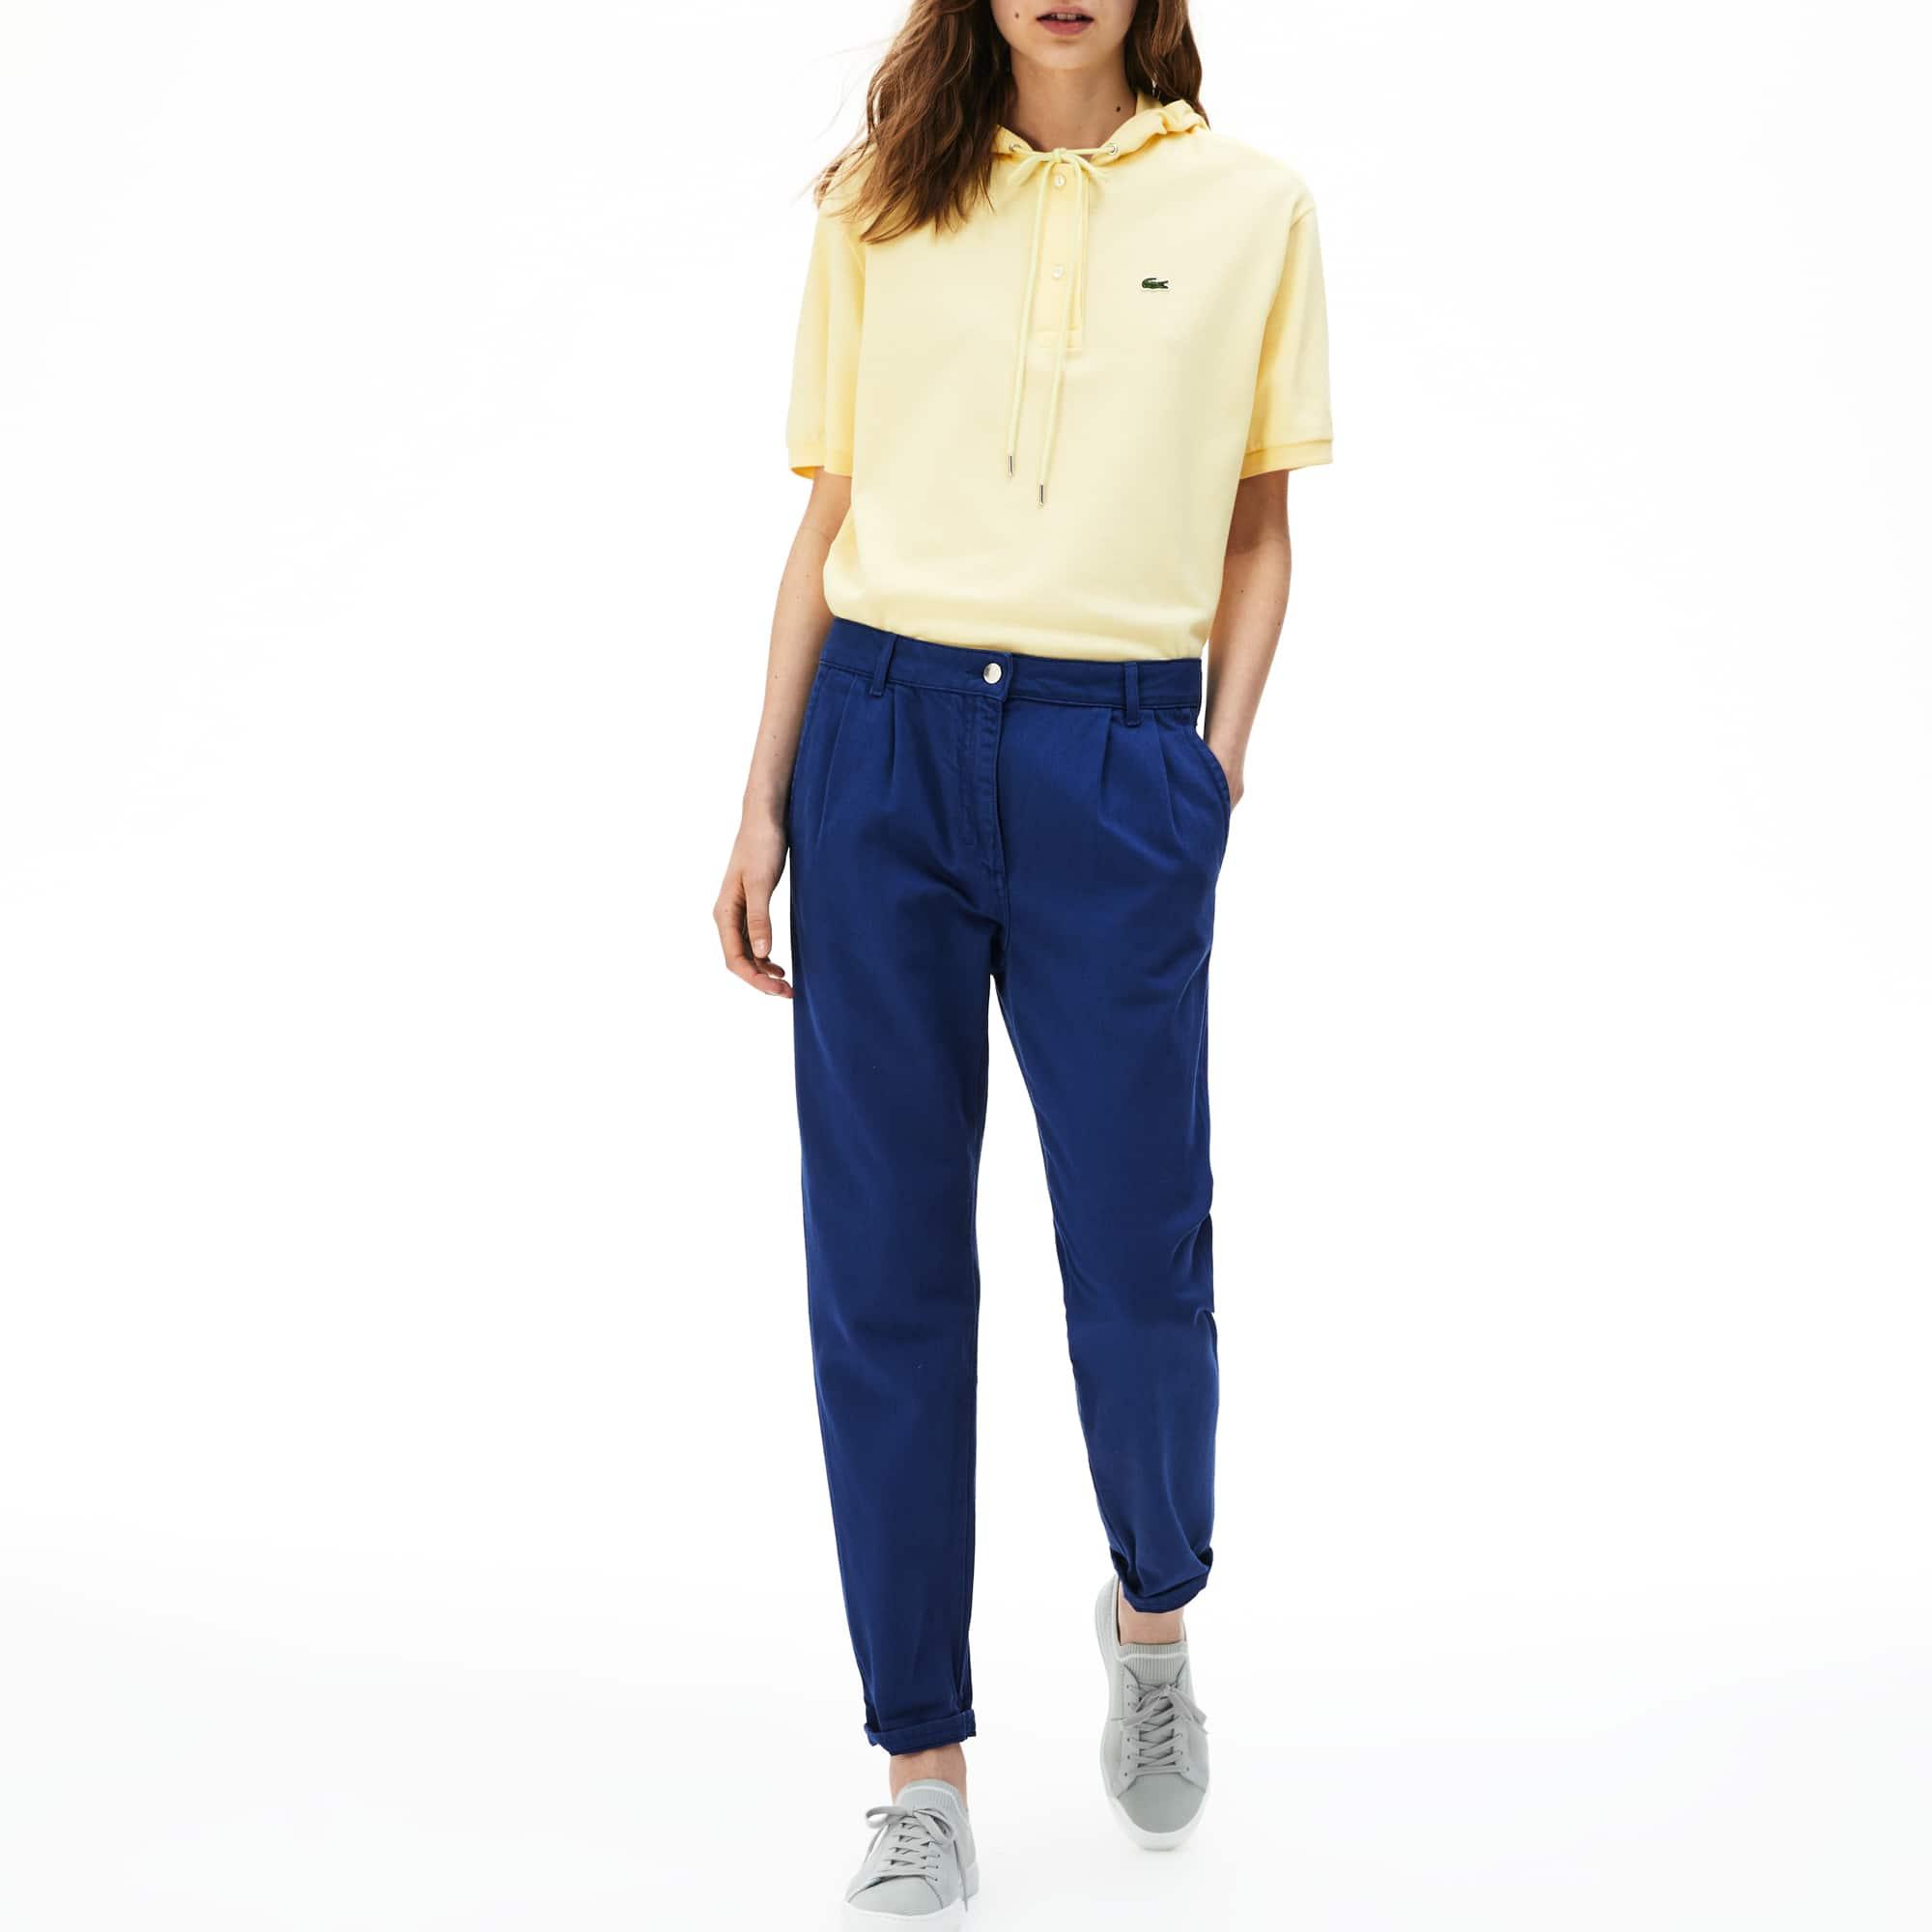 Geruite Korte Broek Dames.Trousers And Shorts Women S Fashion Lacoste